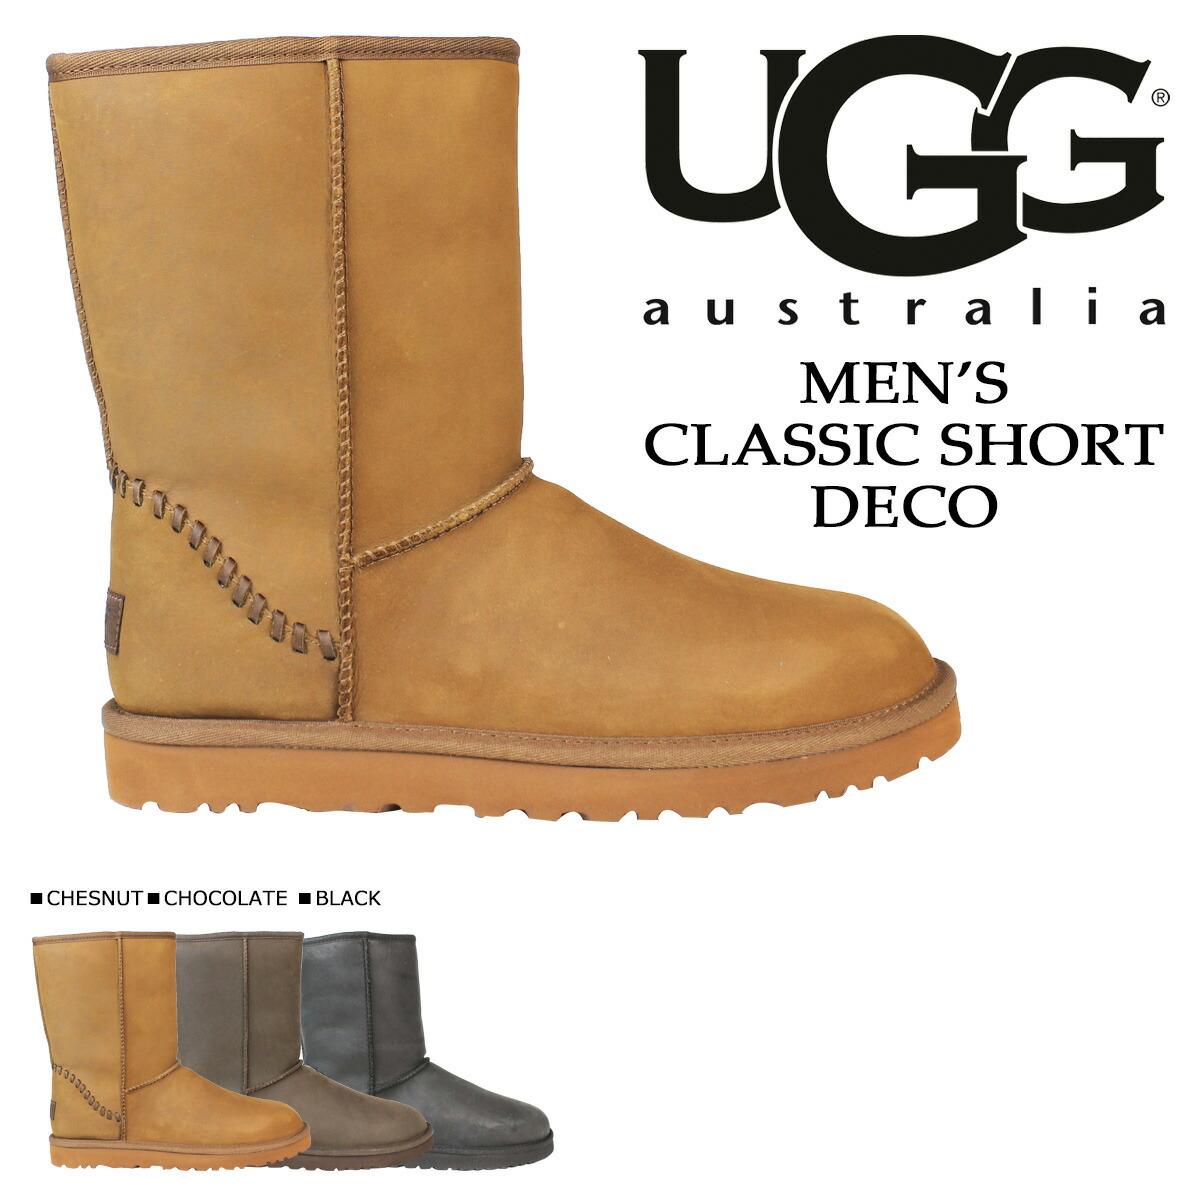 fe4b1fa9a18 アグ UGG men classical music short mouton boots MENS CLASSIC SHORT DECO  1007307 sheepskin